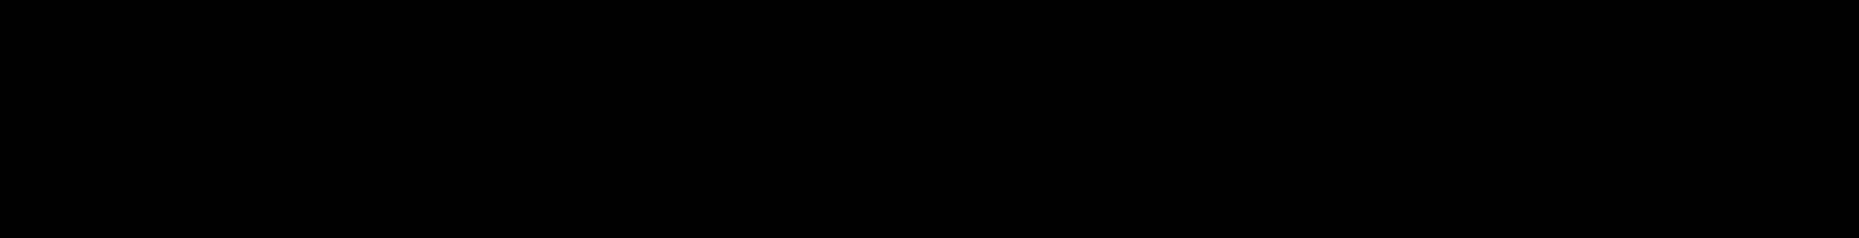 nowstream logo